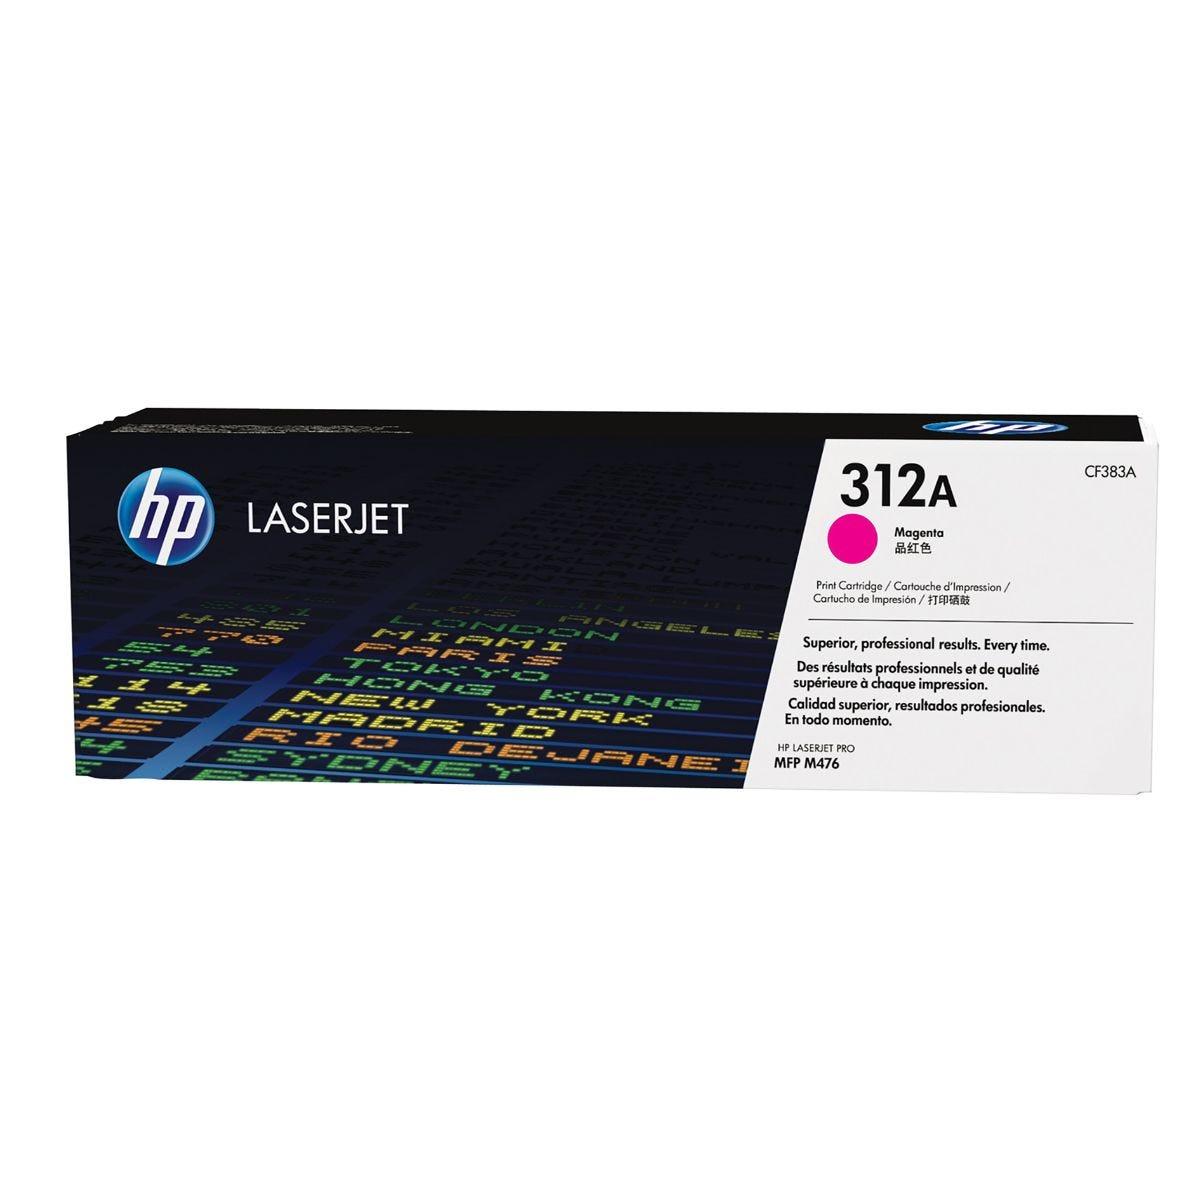 Image of HP 312A Laser Toner Cartridge Magenta CF383A, Magenta